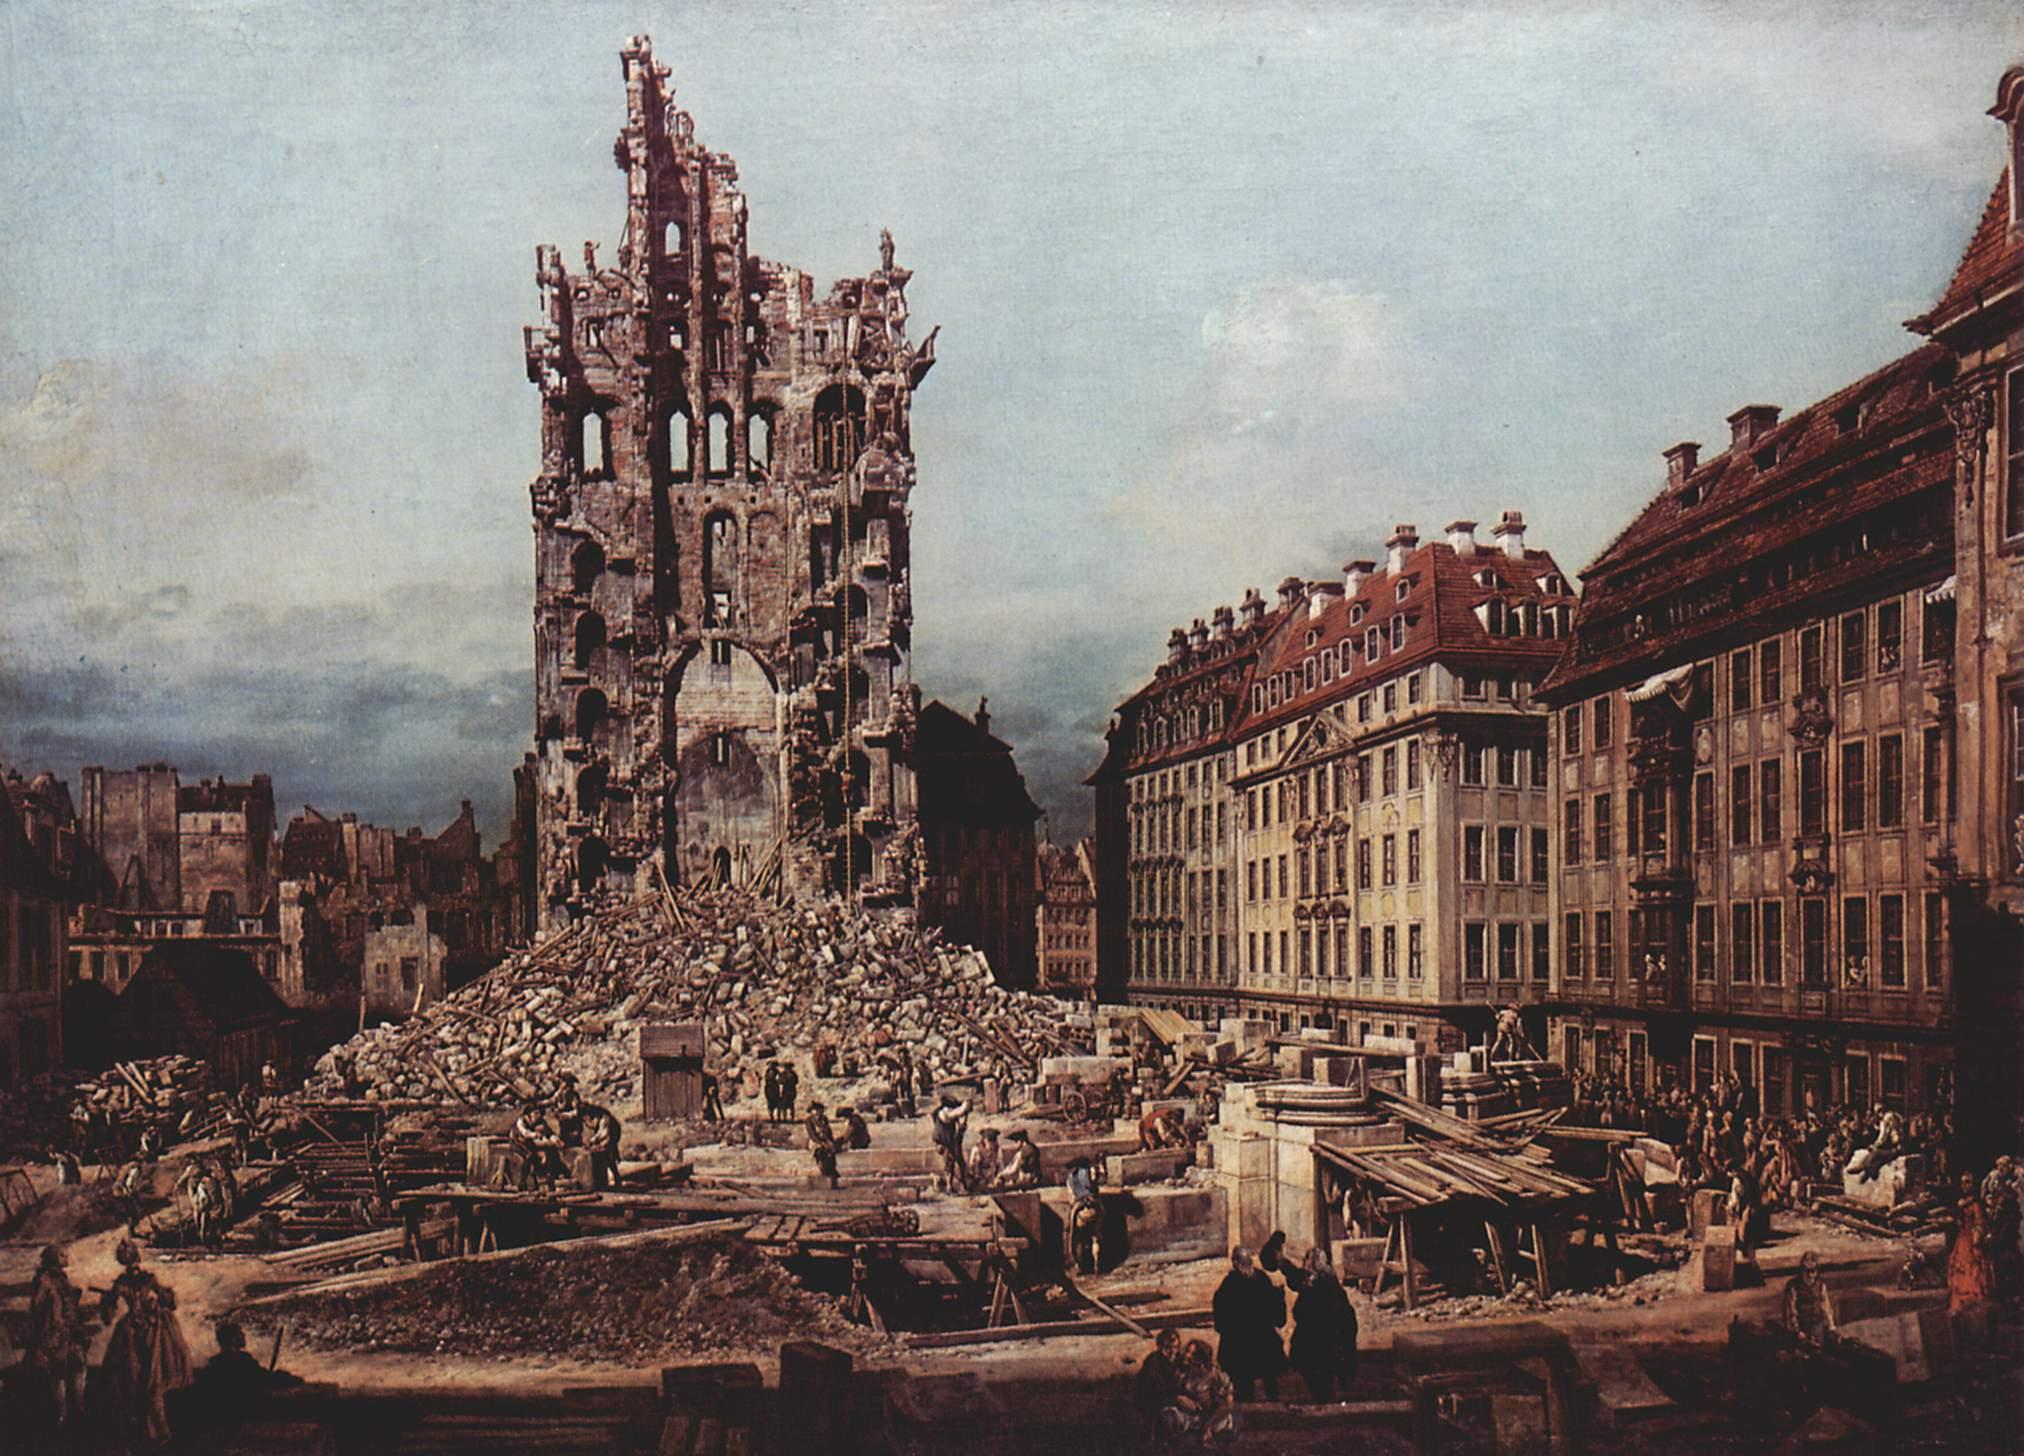 Вид Дрездена, руины церкви Воздвижения, вид с востока, Джованни Антонио Каналетто 1